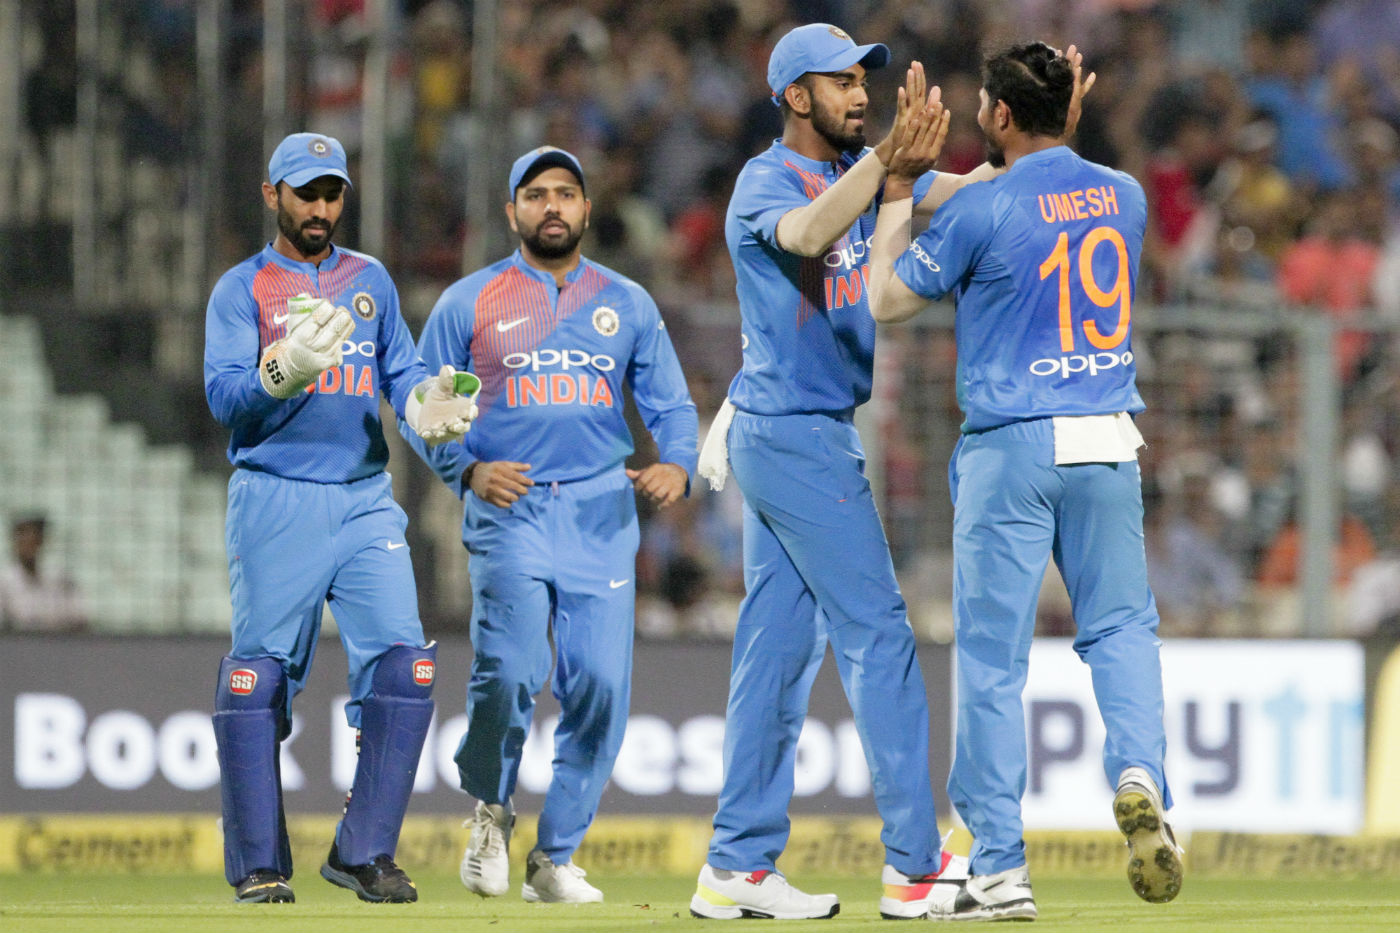 India vs Windies, 2018: 1st T20I – Statistical Highlights